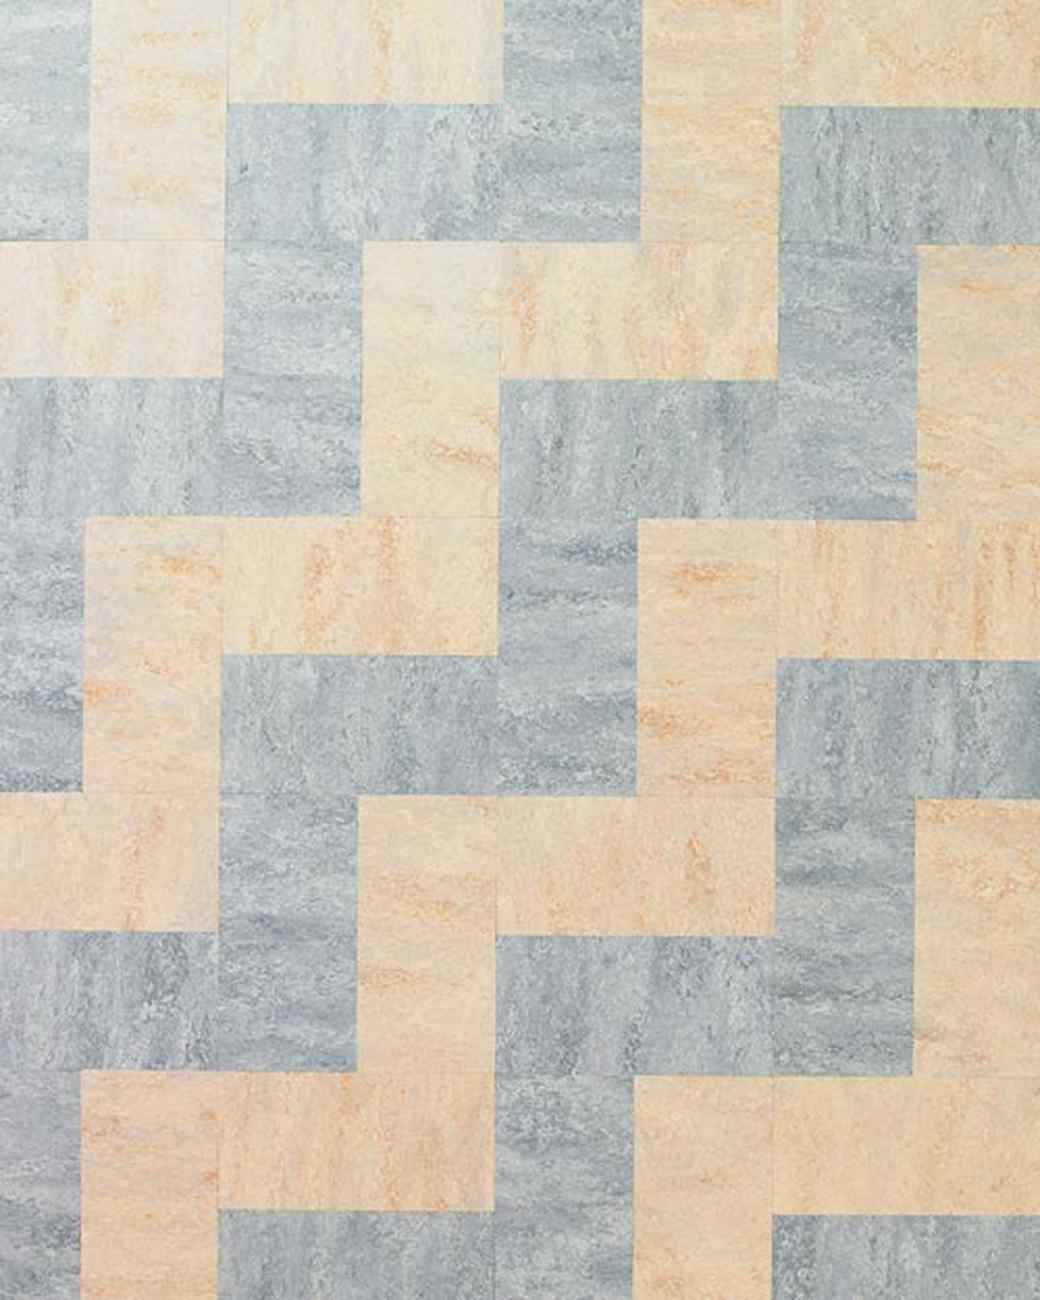 floor tile patterns - Vatoz.atozdevelopment.co